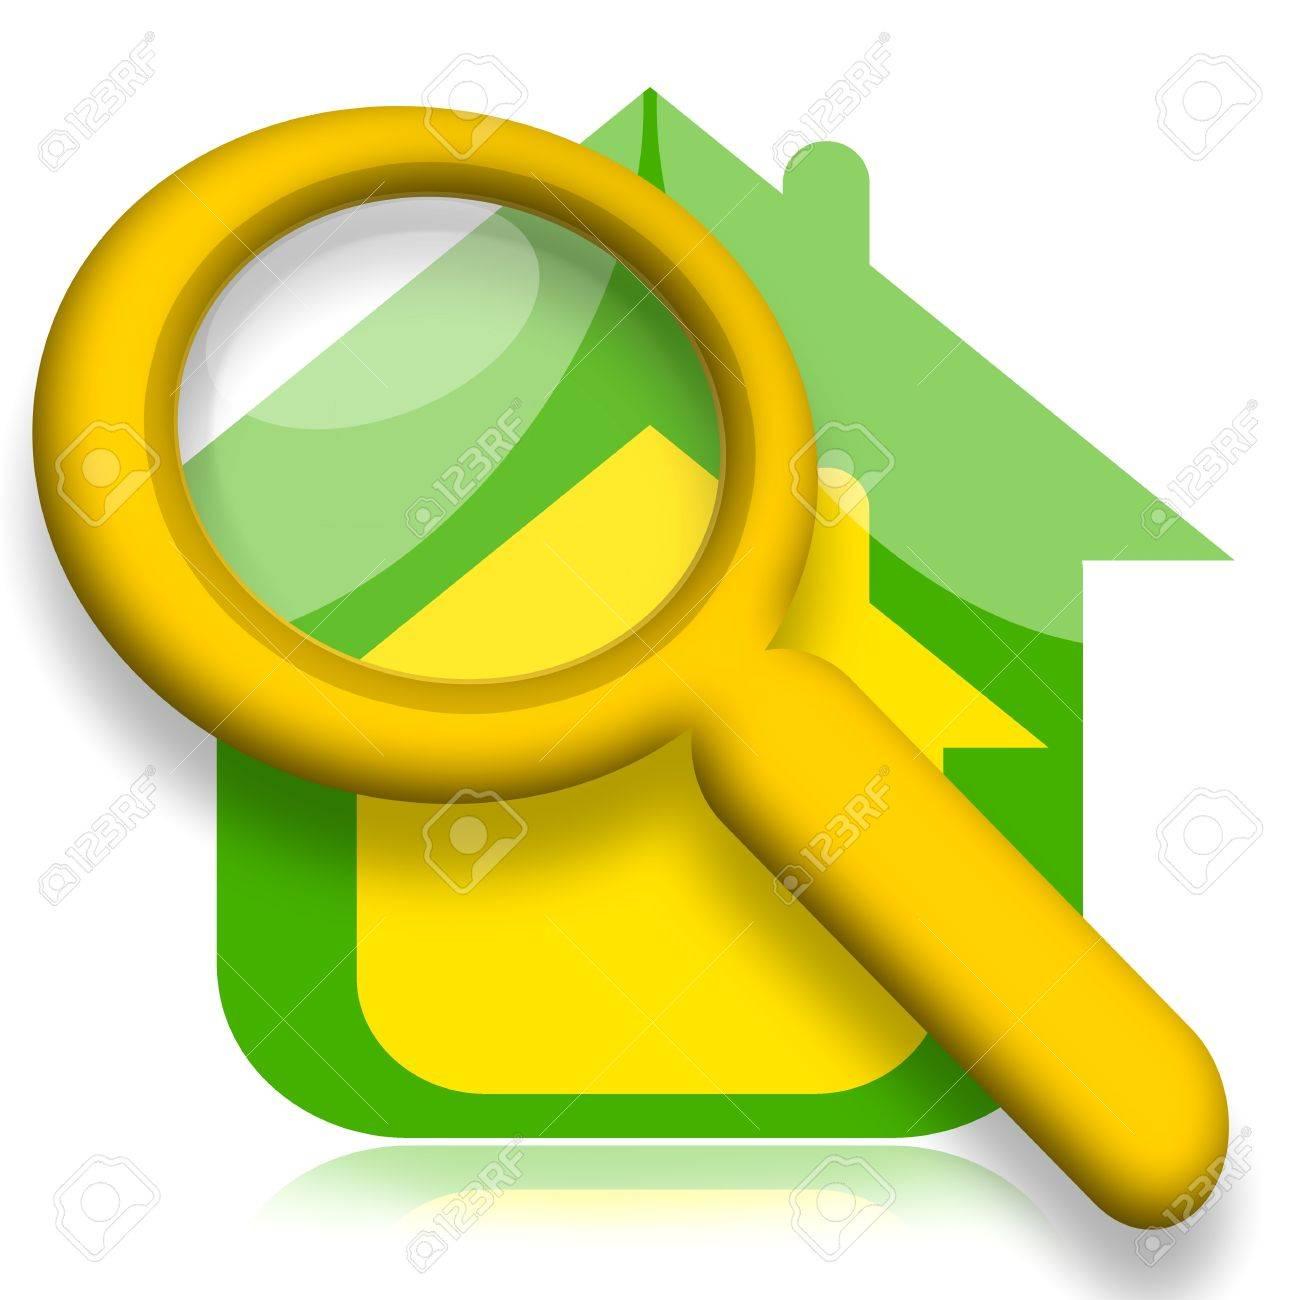 House under magnifying glass illustration over white background Stock Illustration - 15149982